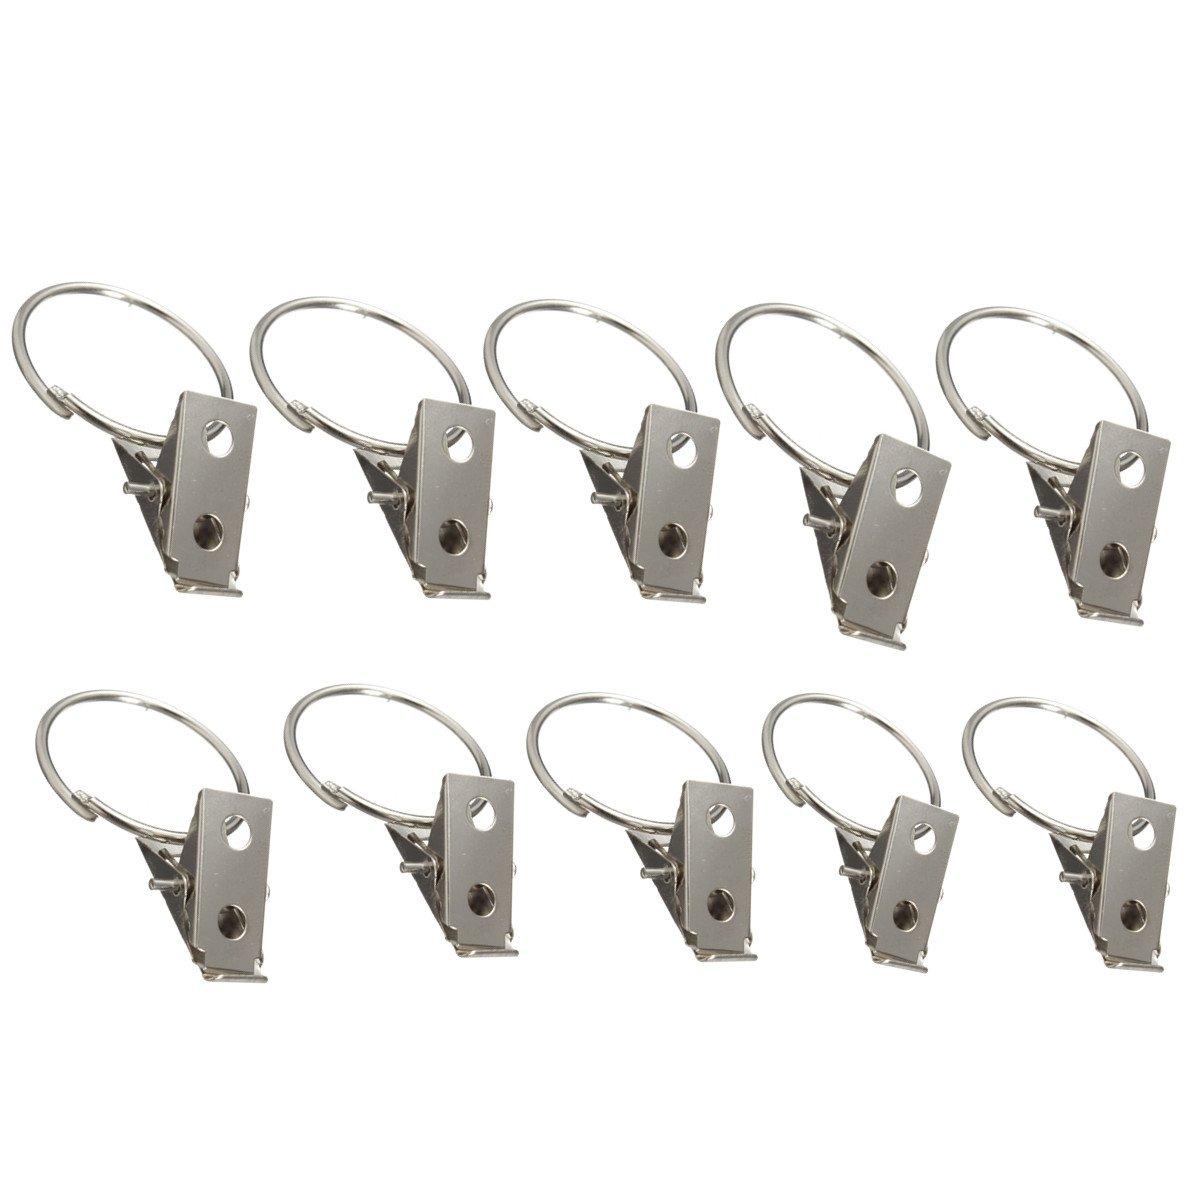 10pcs Metal Hooks Window Curtain Rod Clip Drapery Clips Rings Dm